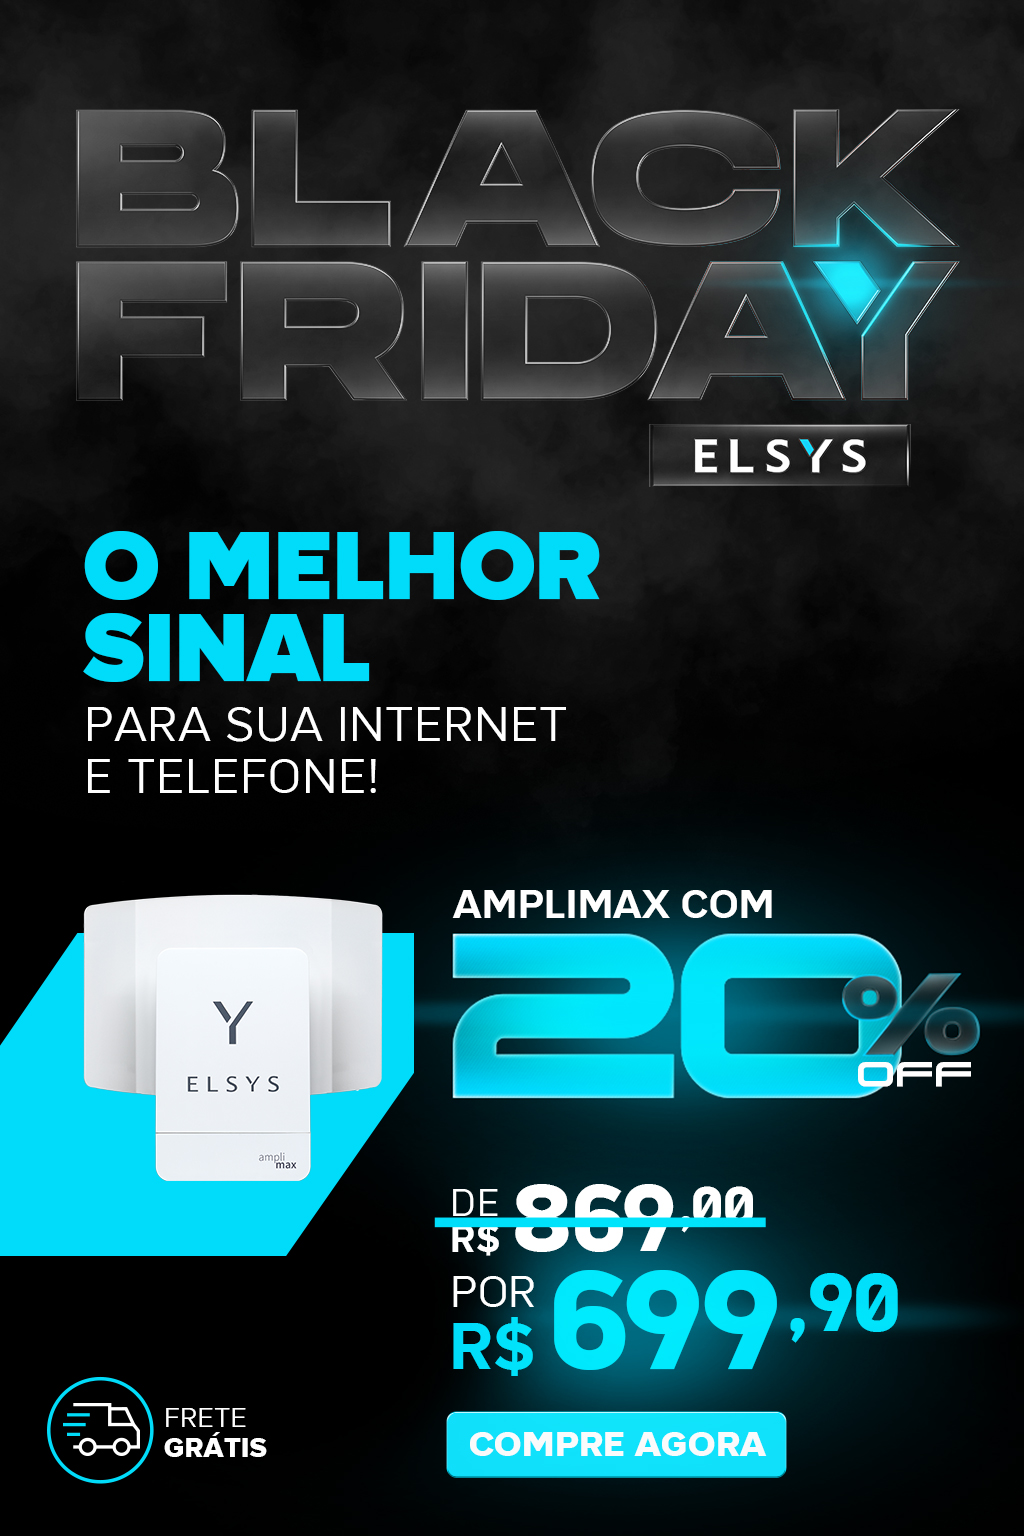 BLACK FRIDAY ELSYS - AMPLIMAX